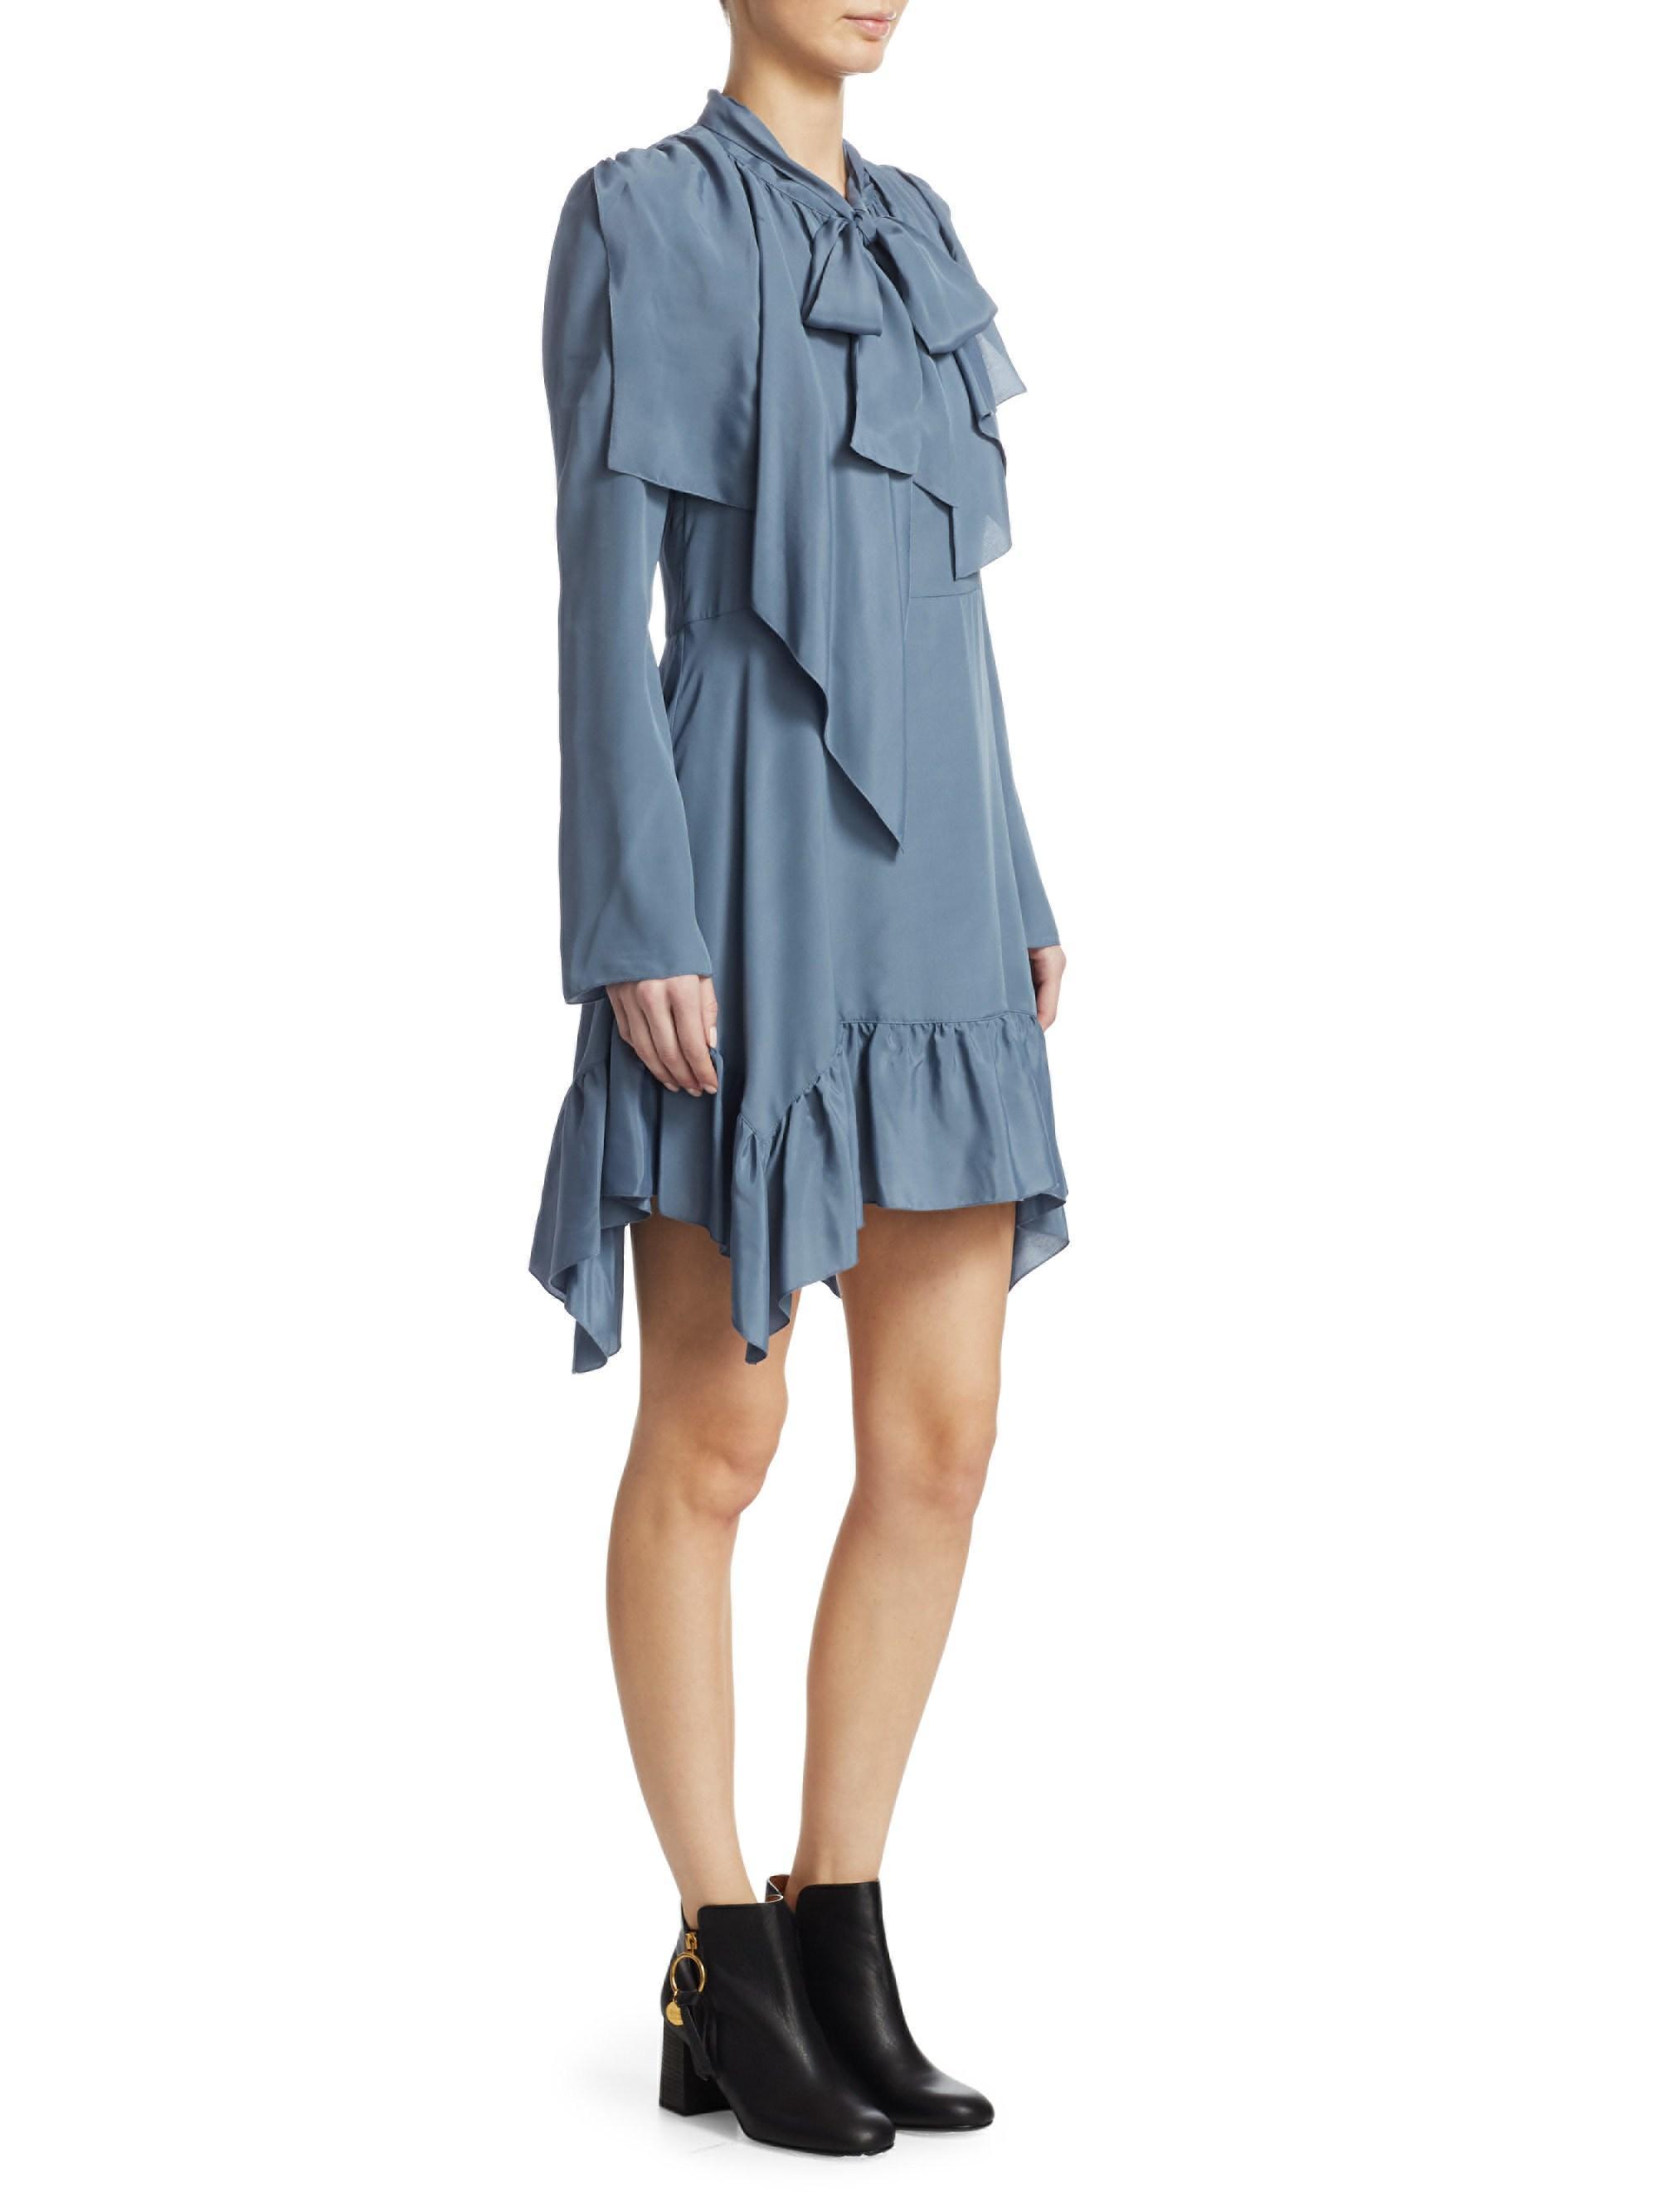 7496e449 Women's Blue Crepe Tie Neck Mini Dress